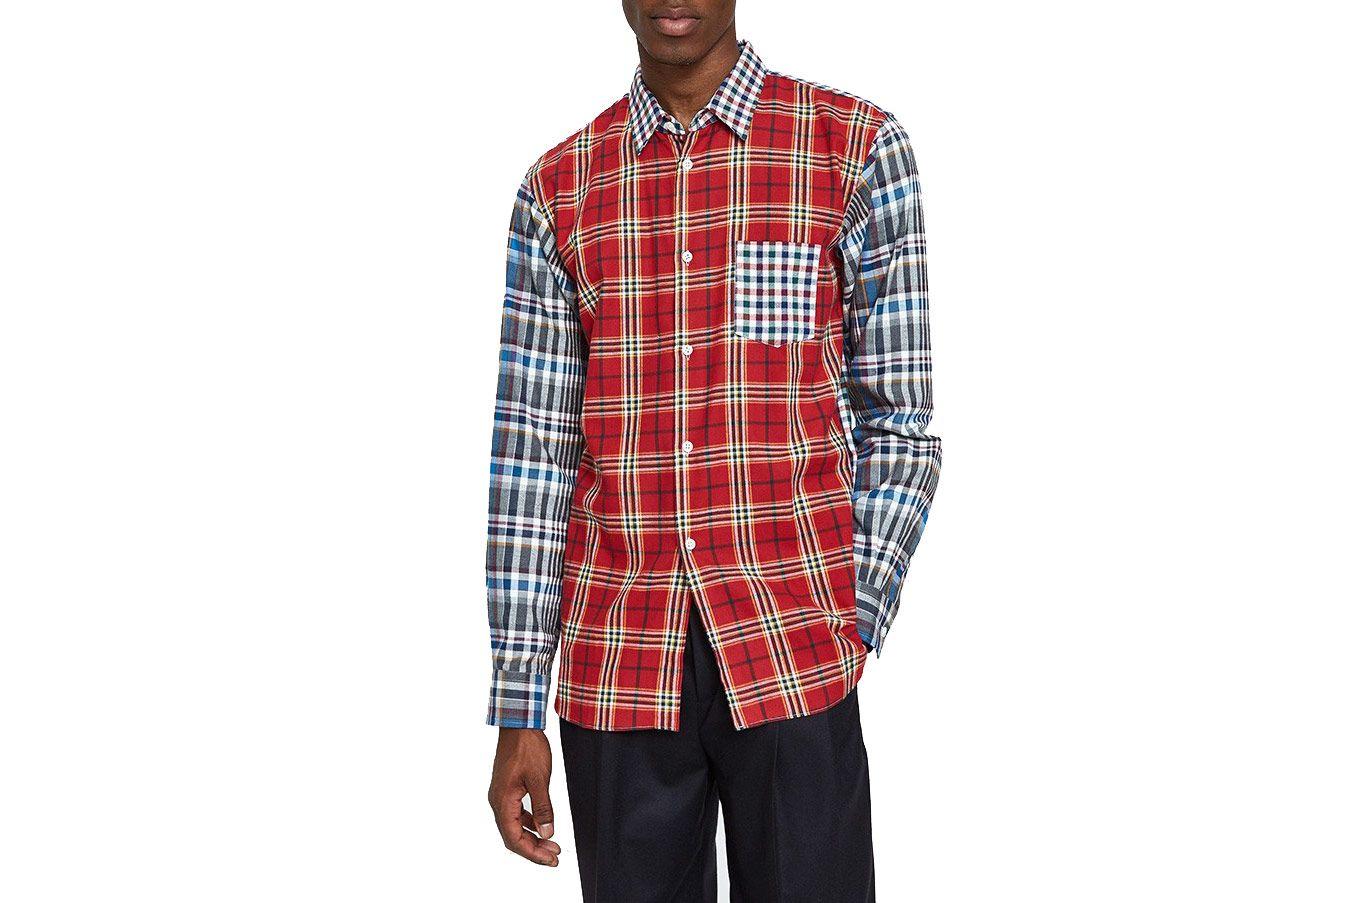 Comme des Garçons Shirt Cotton Check x Cotton Tartan Check Shirt